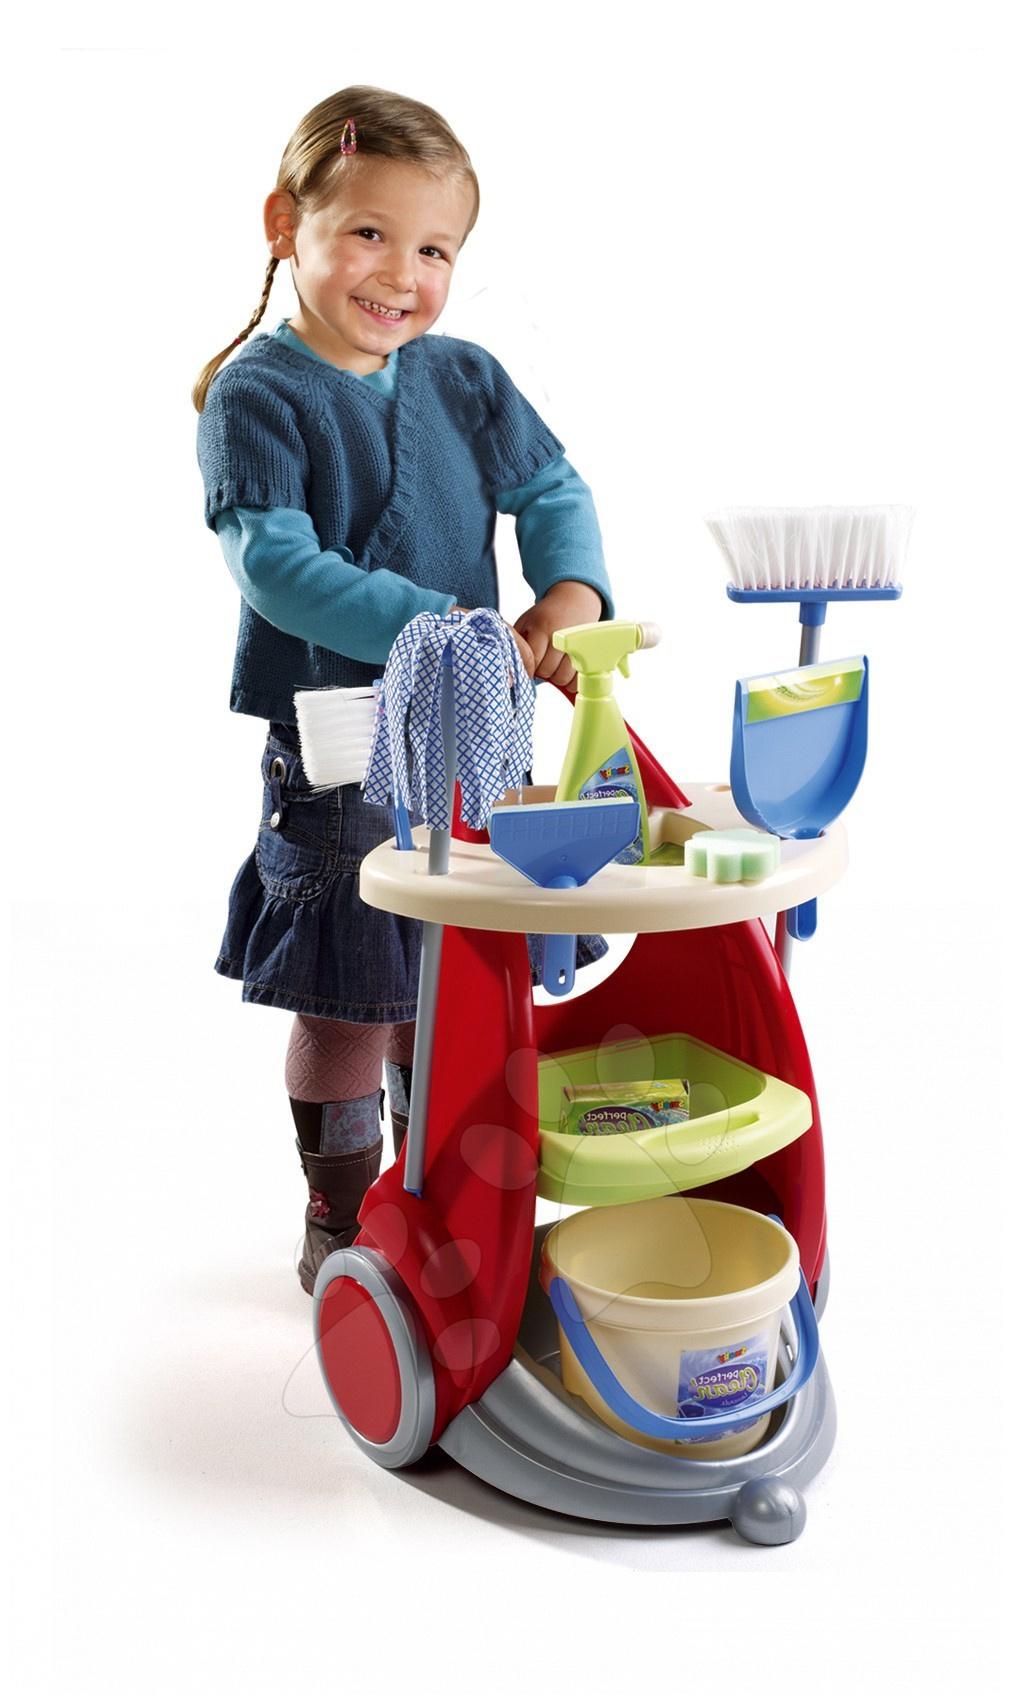 Staré položky - Úklidový vozík Clean Service Smoby červený